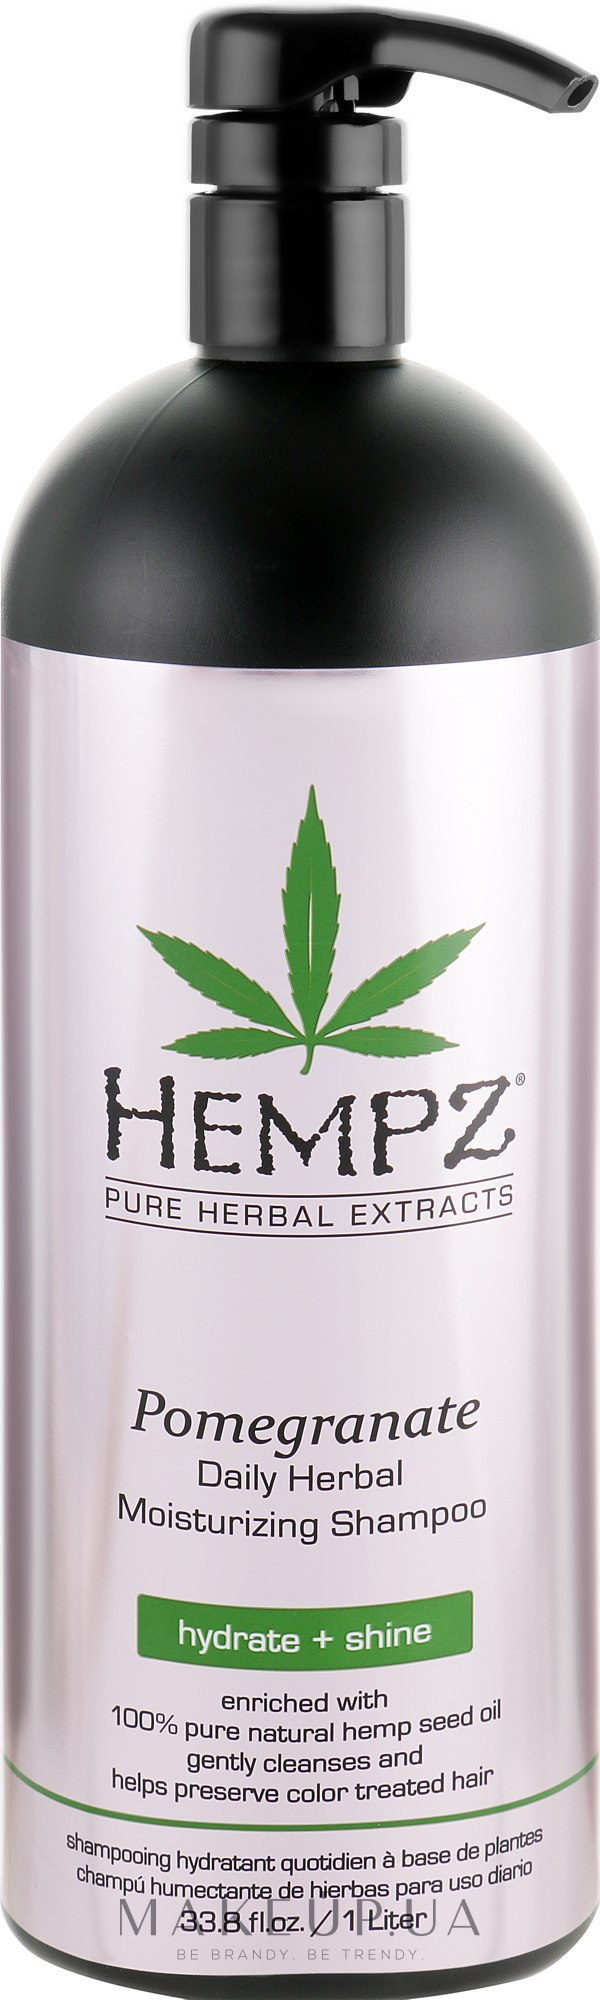 "Шампунь для волос ""Гранат"" увлажняющий - Hempz Daily Herbal Moisturizing Pomegranate Shampoo — фото 1000ml"